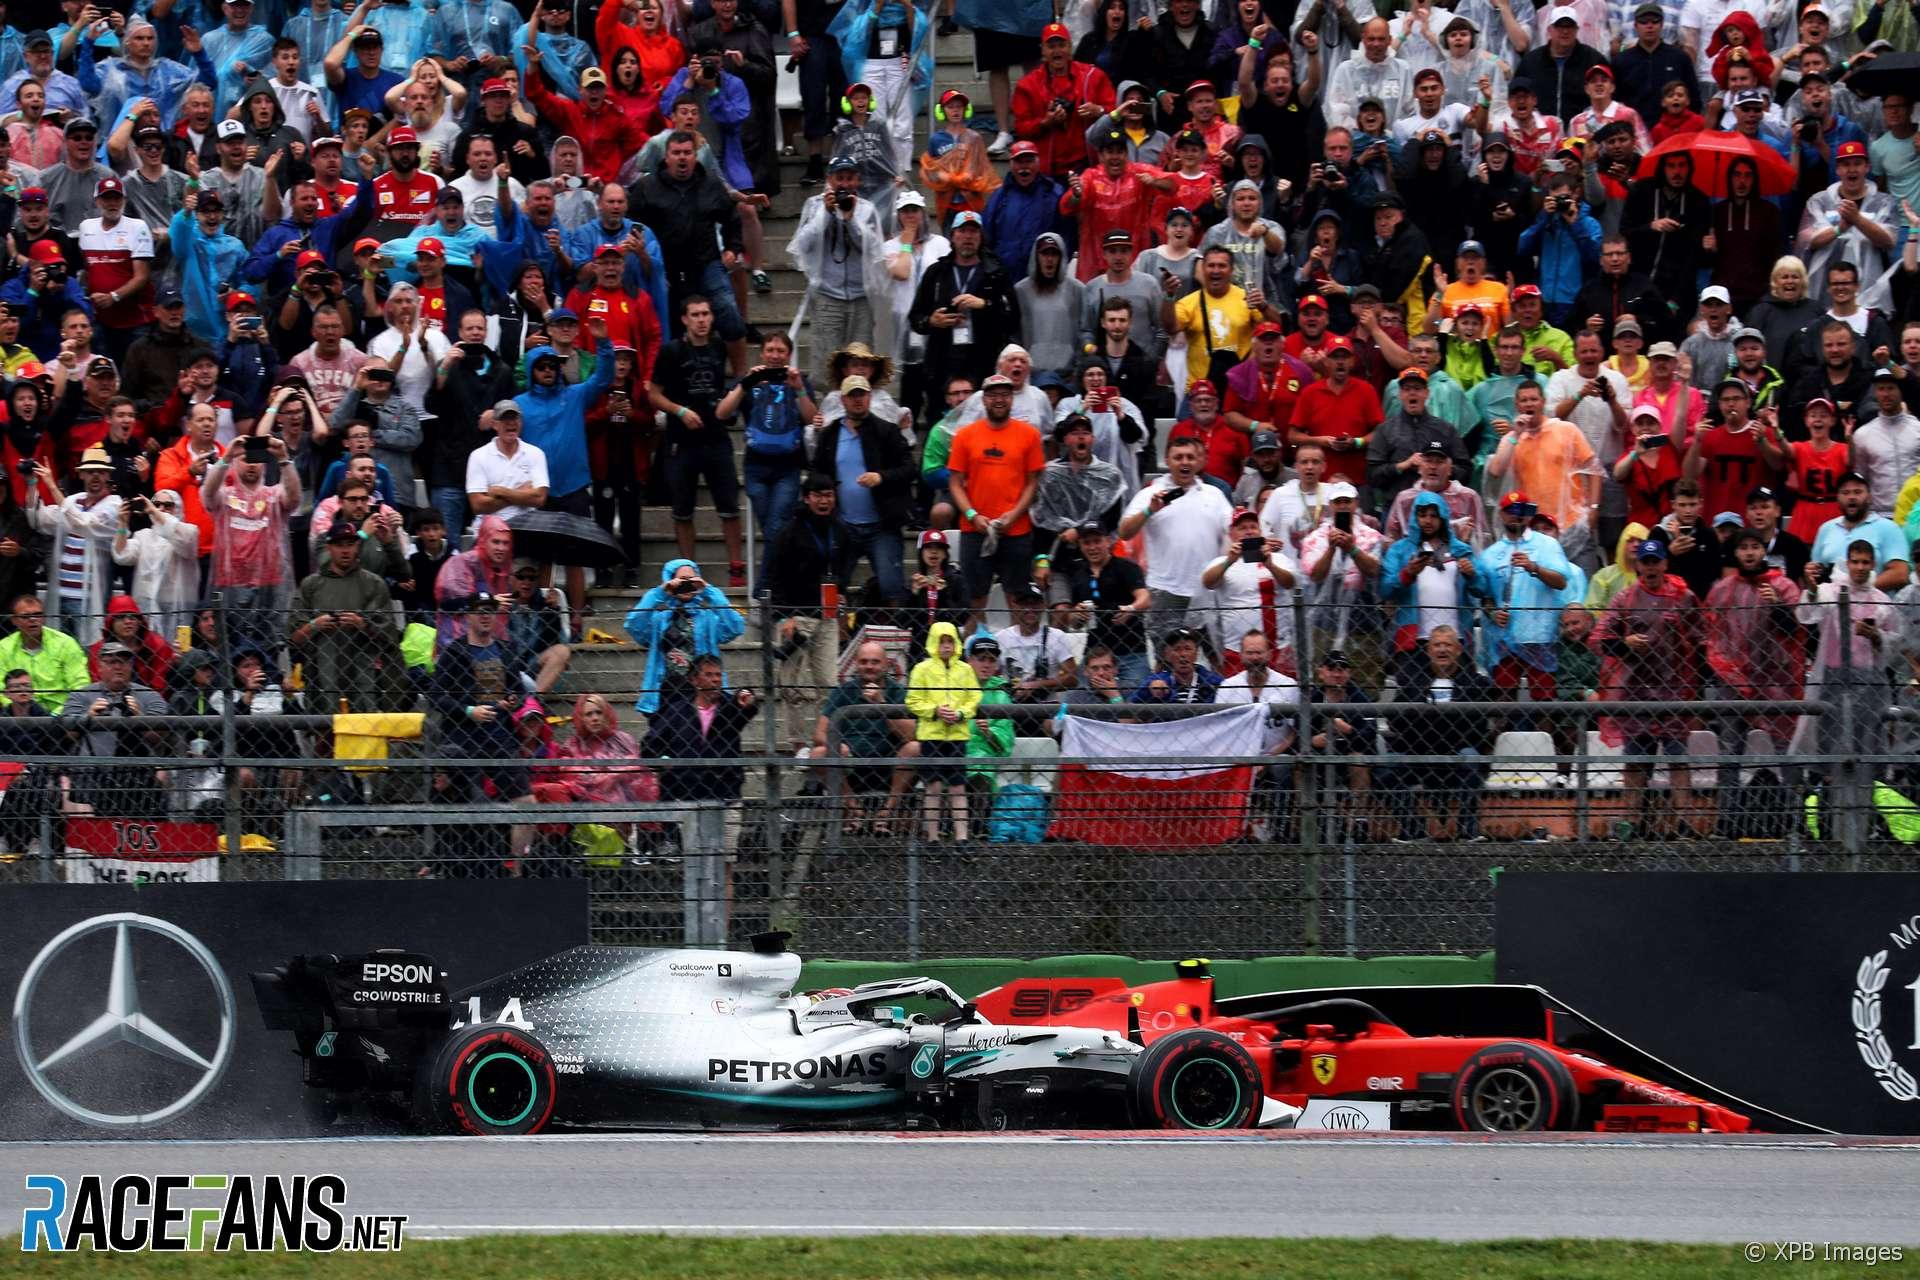 Lewis Hamilton, Charles Leclerc, Hockenheimring, 2019